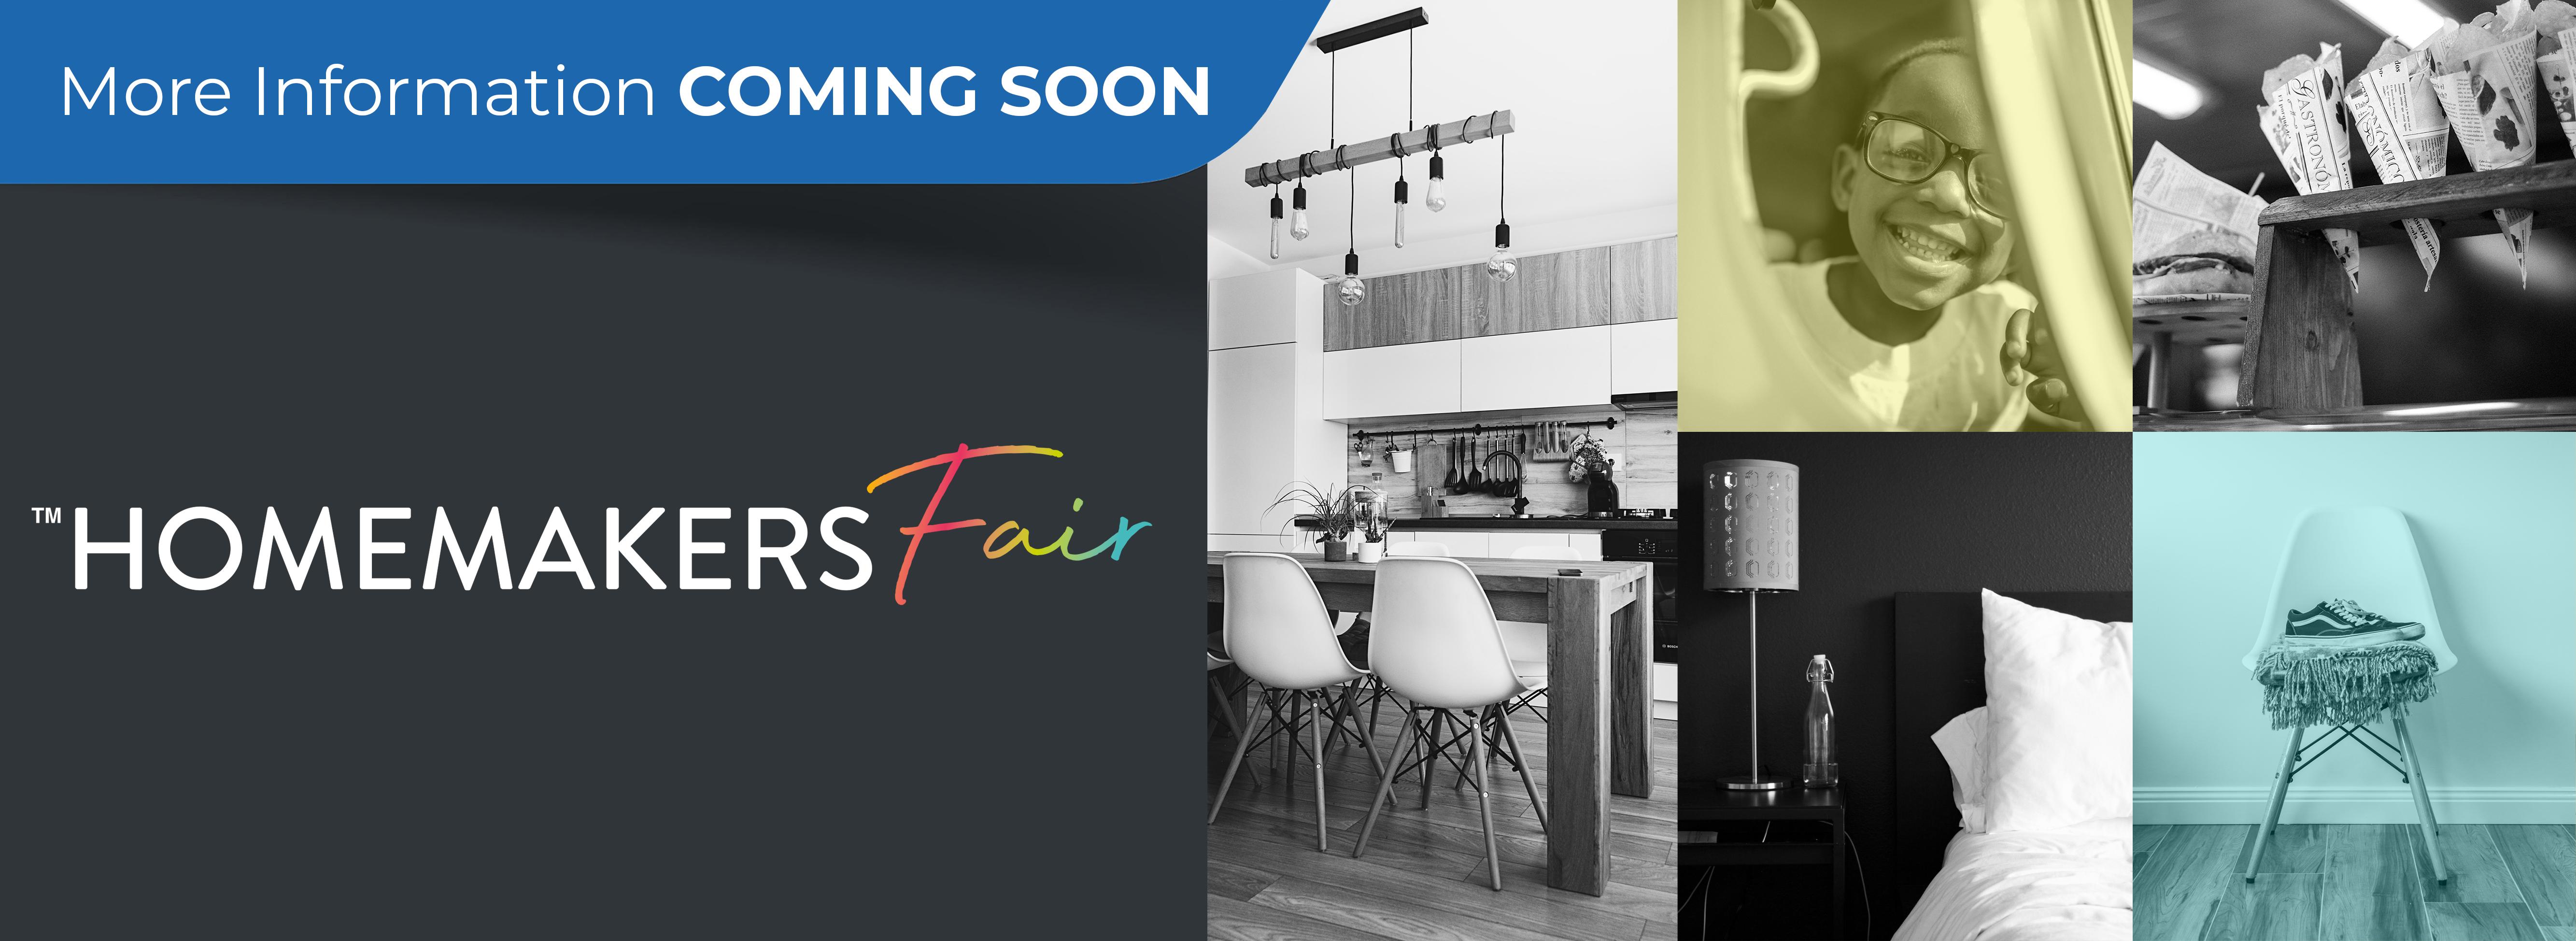 CTHMfair Homepage banner – Coming Soon